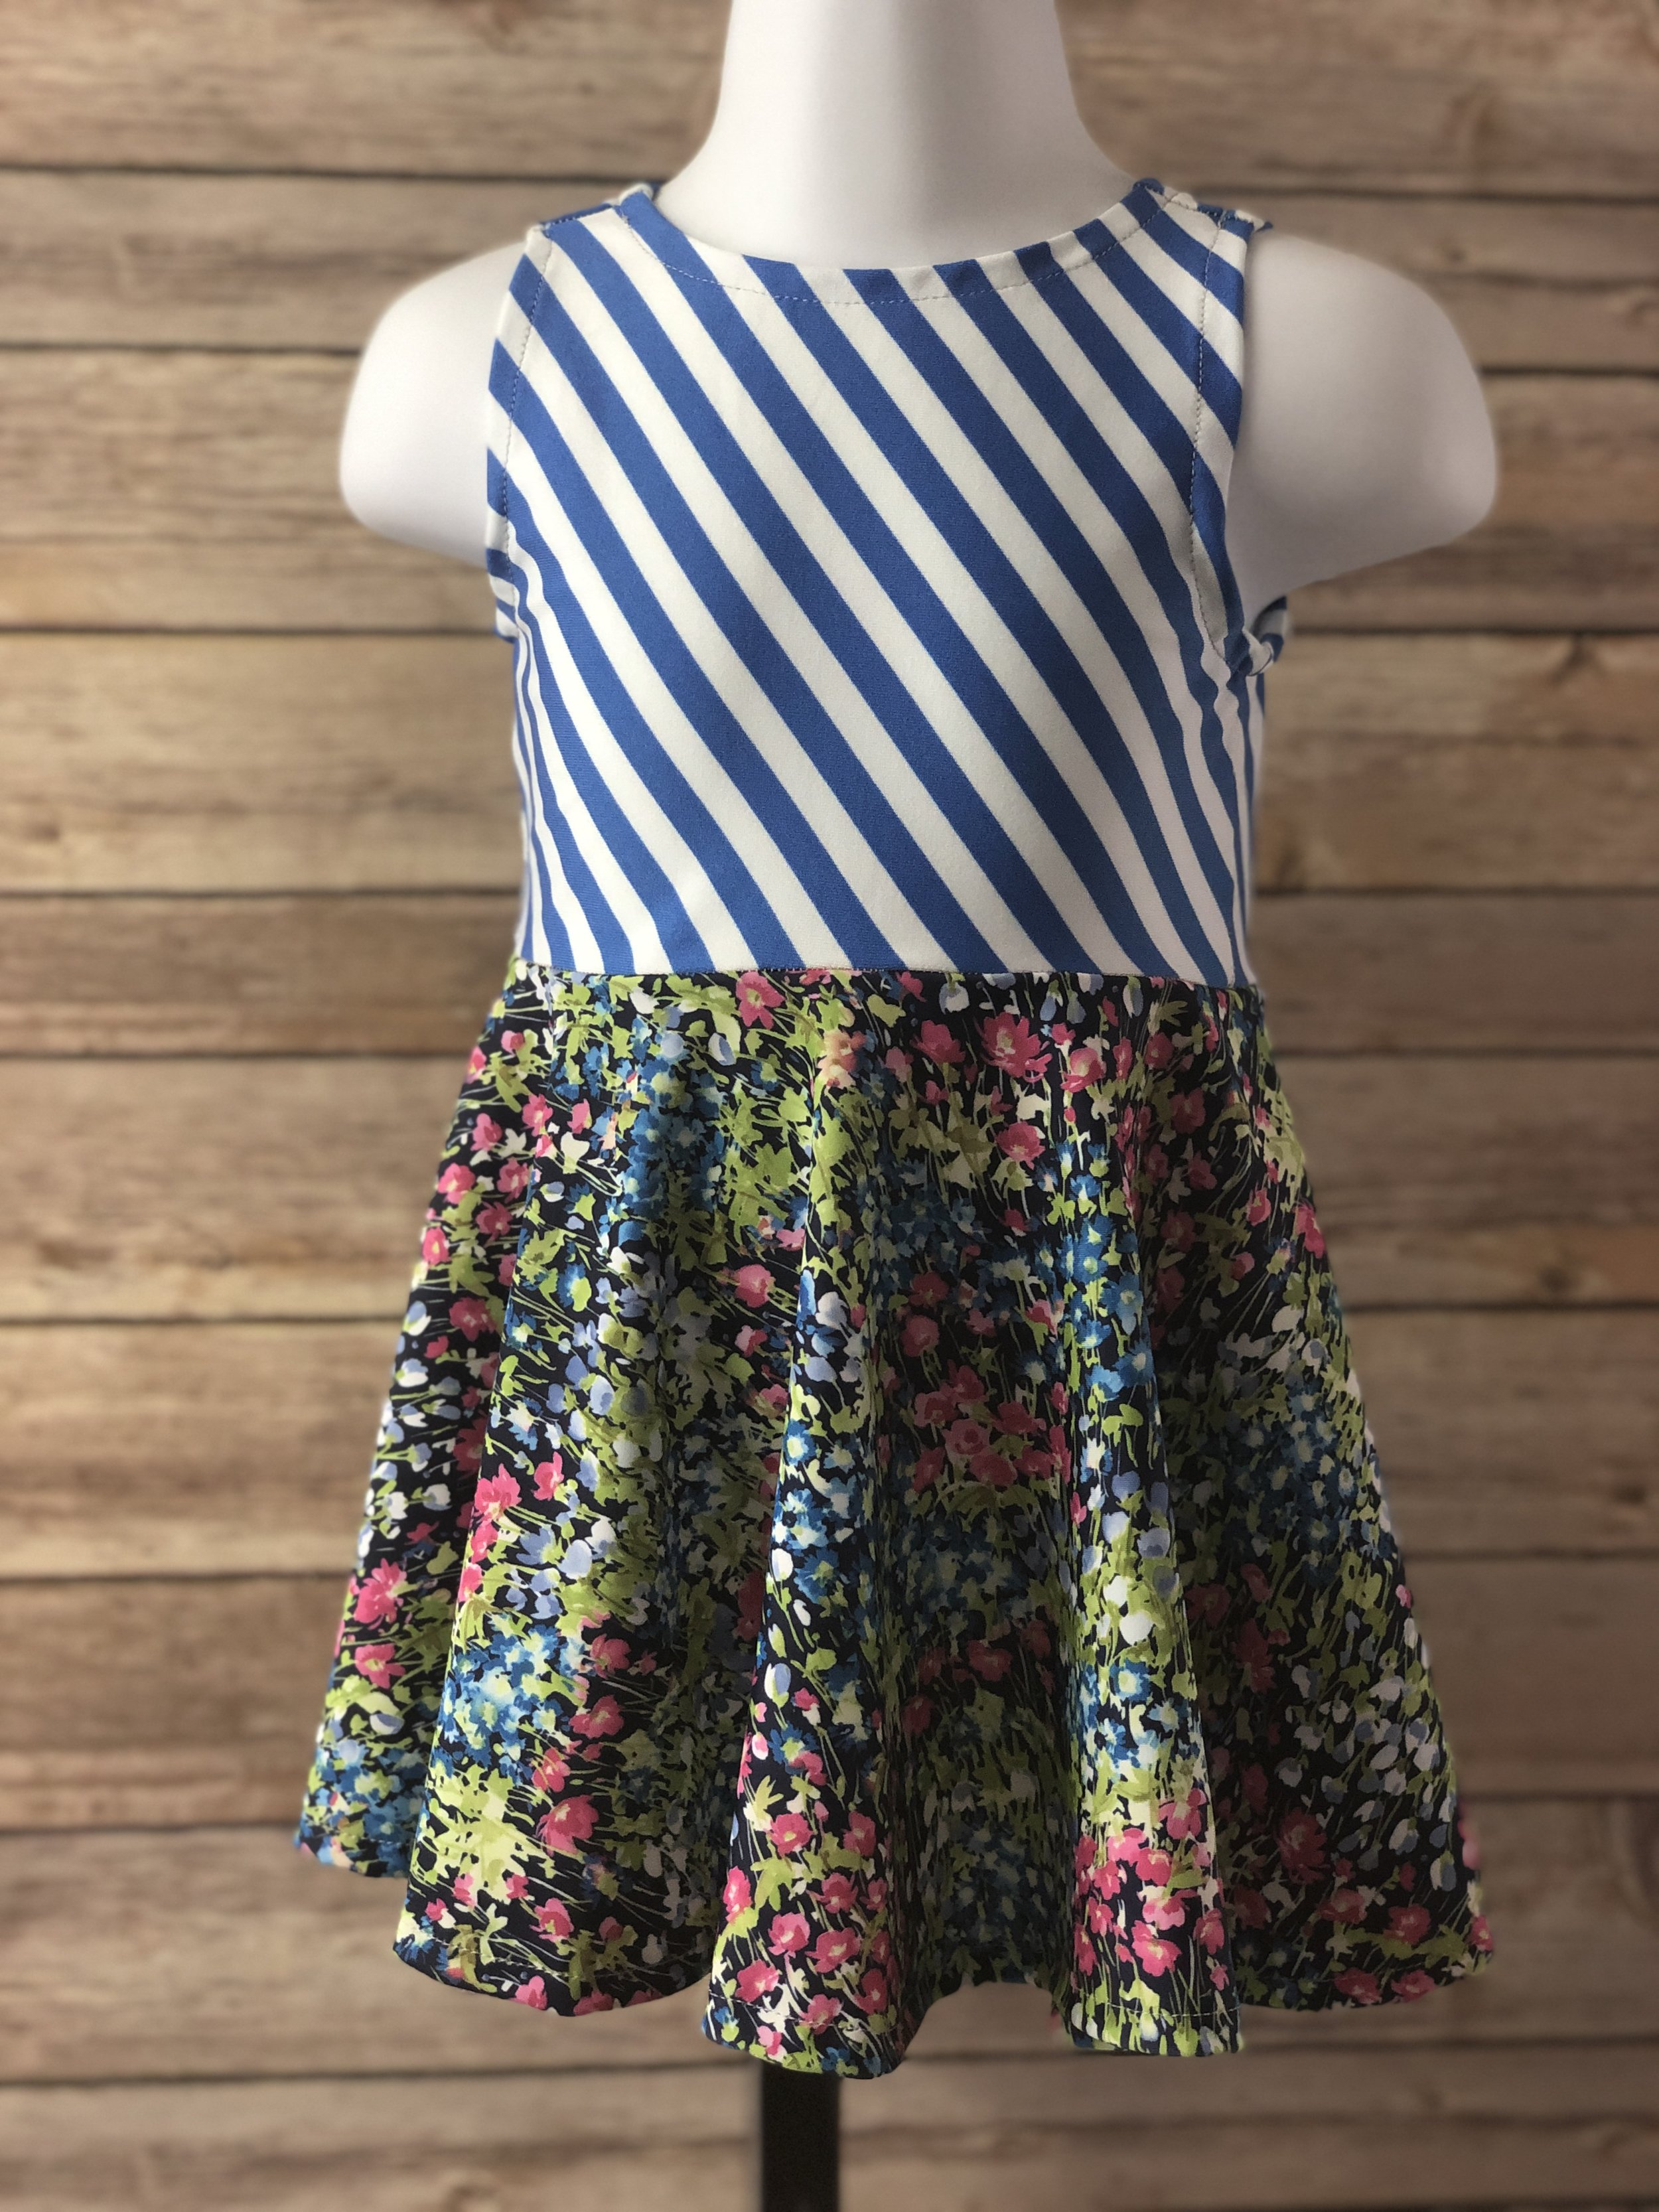 Sophia - Features standard waistline seam and full-circle skirt